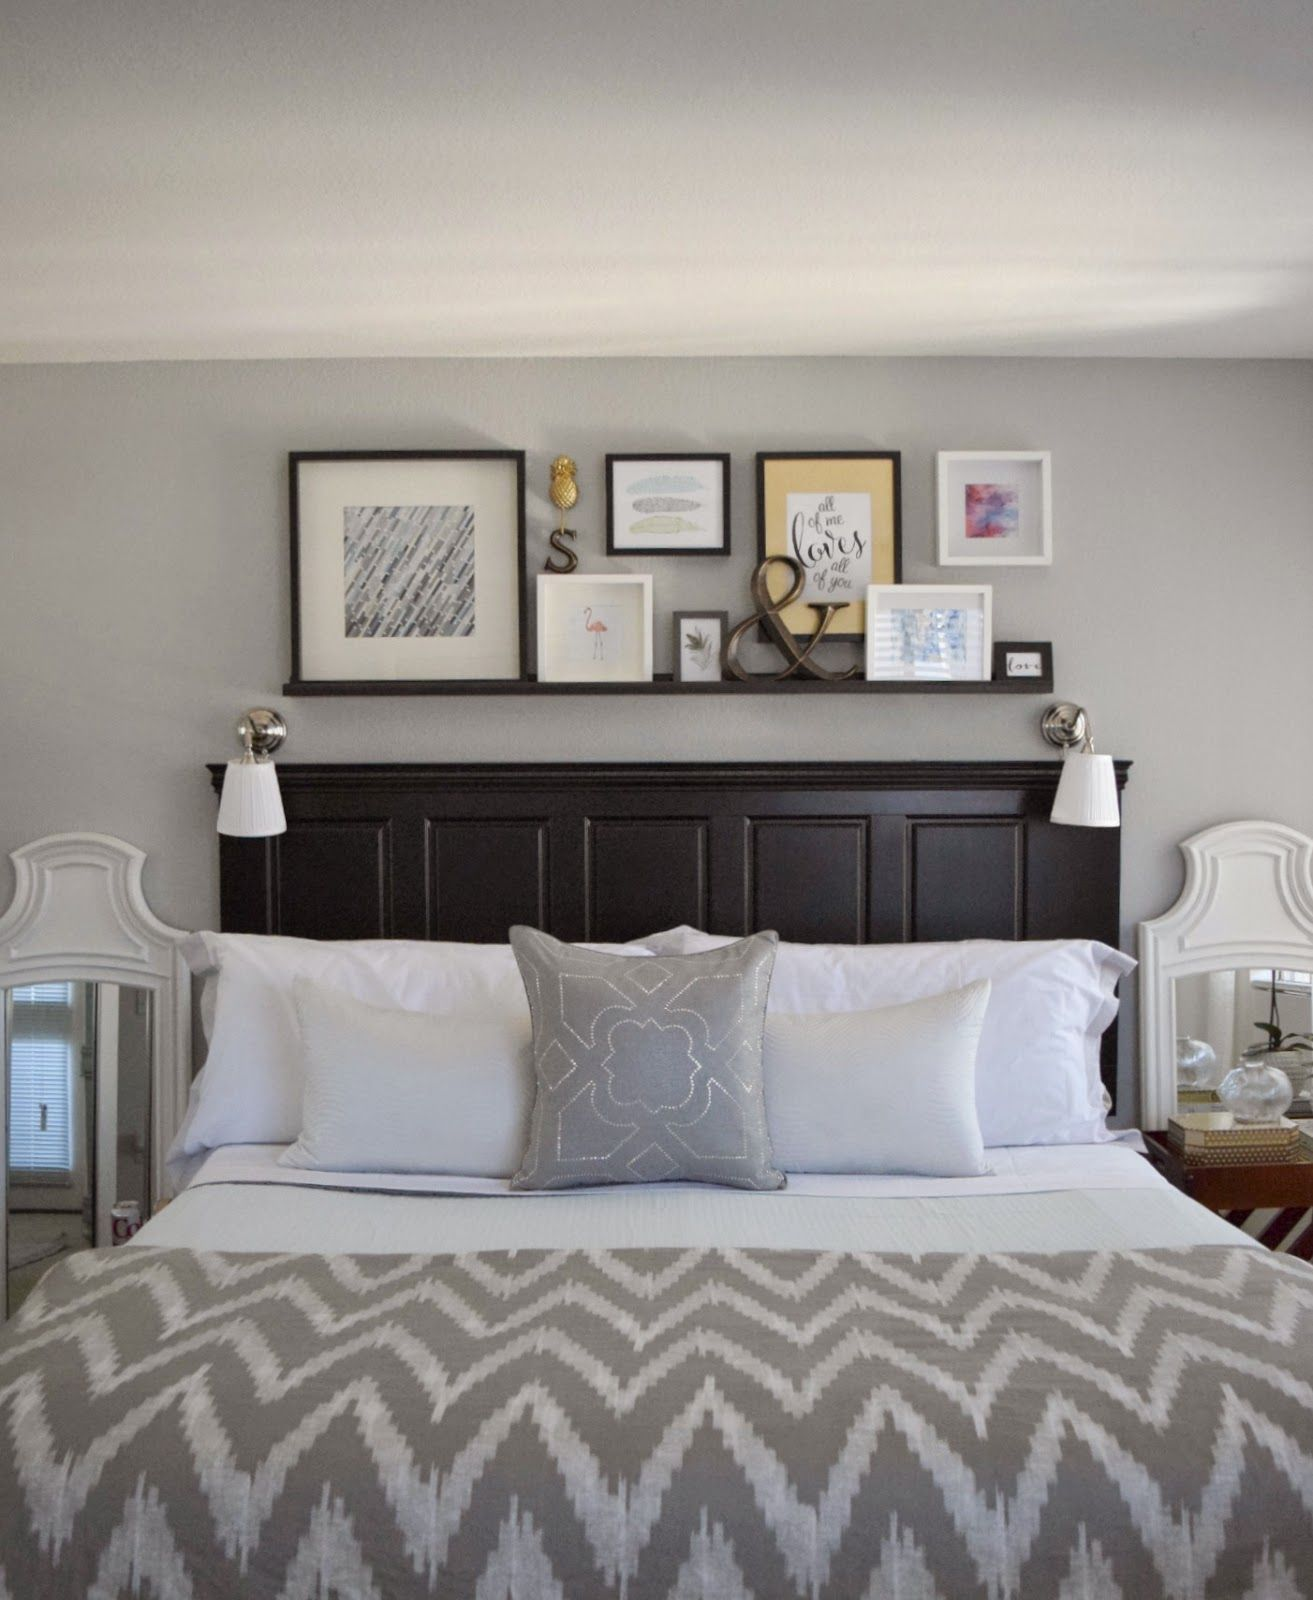 Horizonal overlap photos room decor pinterest bedroom tv stand ikea and designs also rh